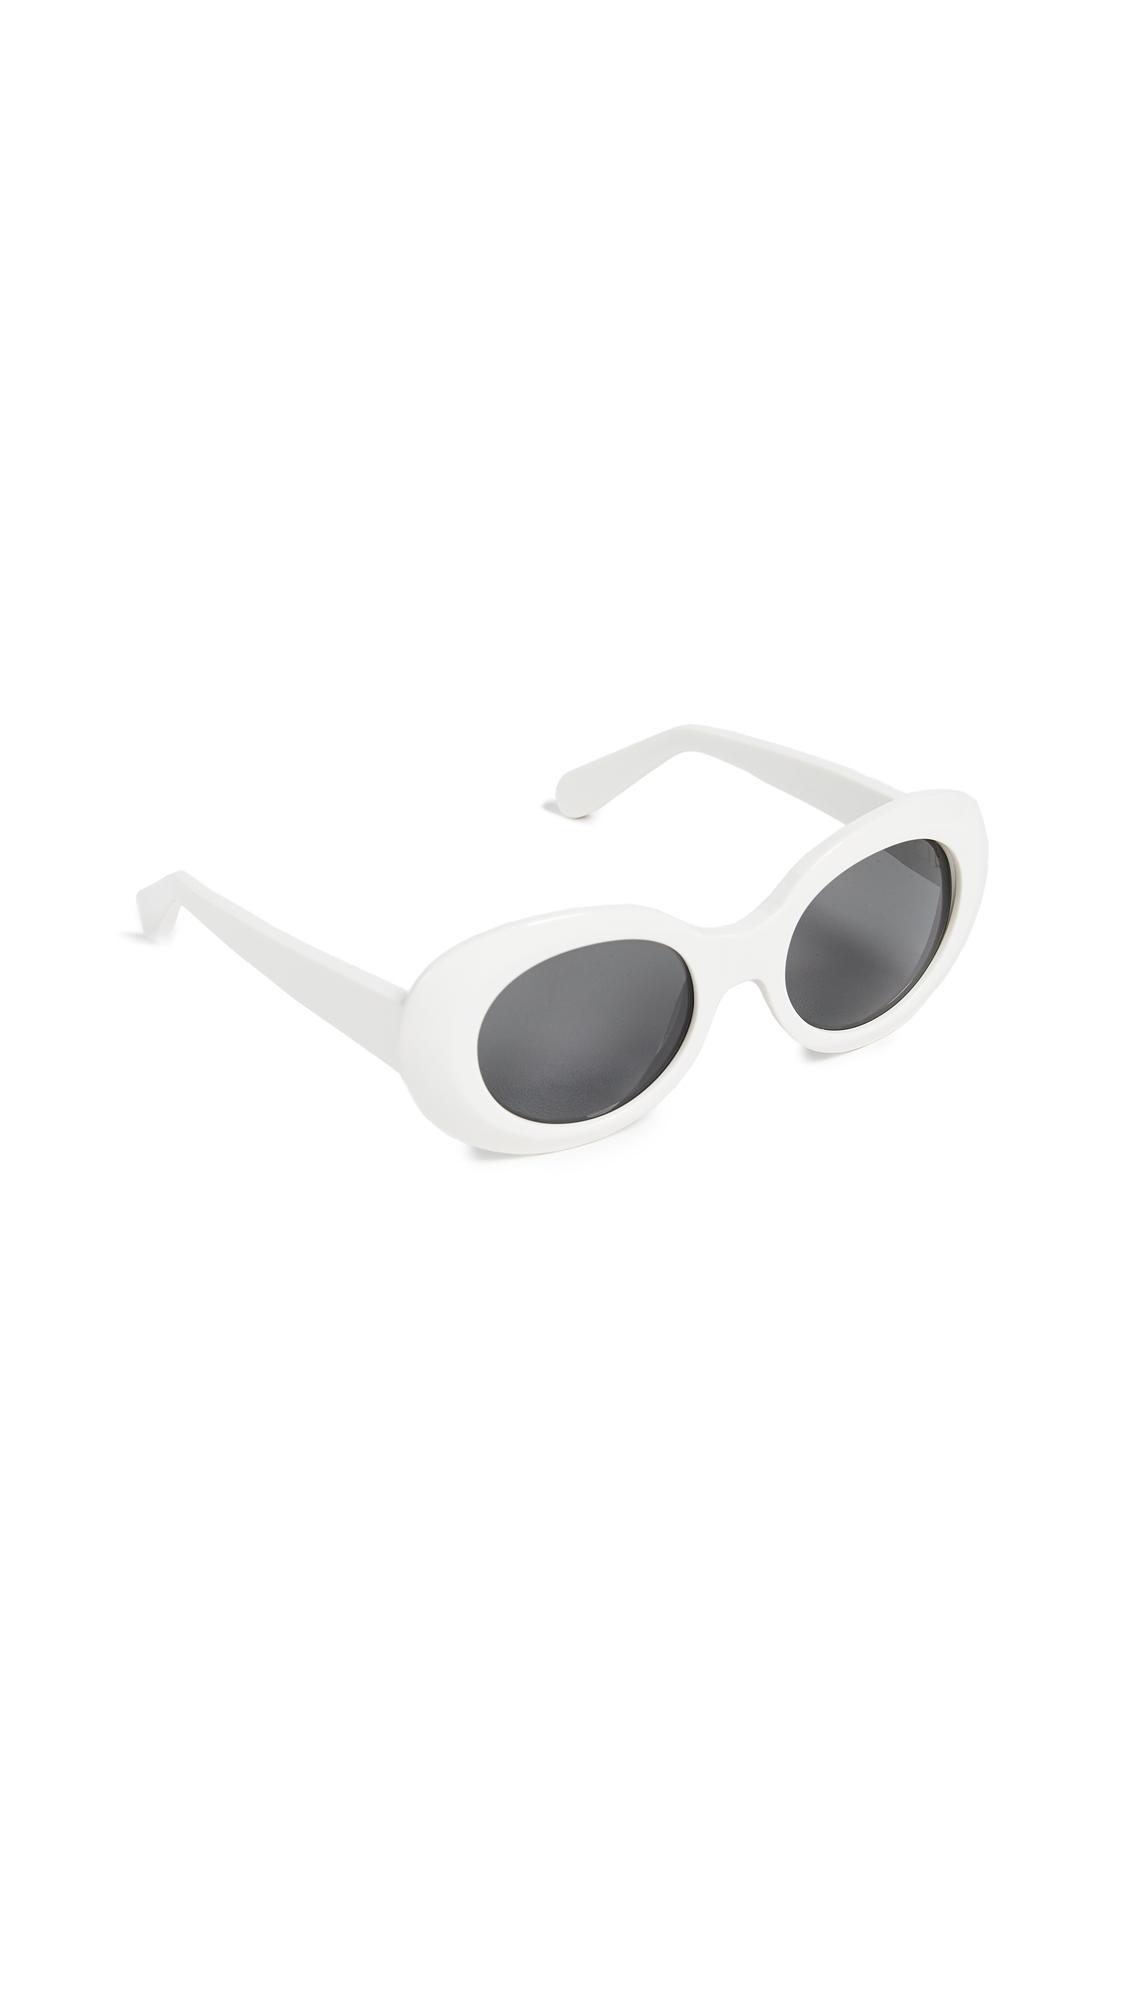 Acne Studios Mustang Sunglasses - Off White/Black